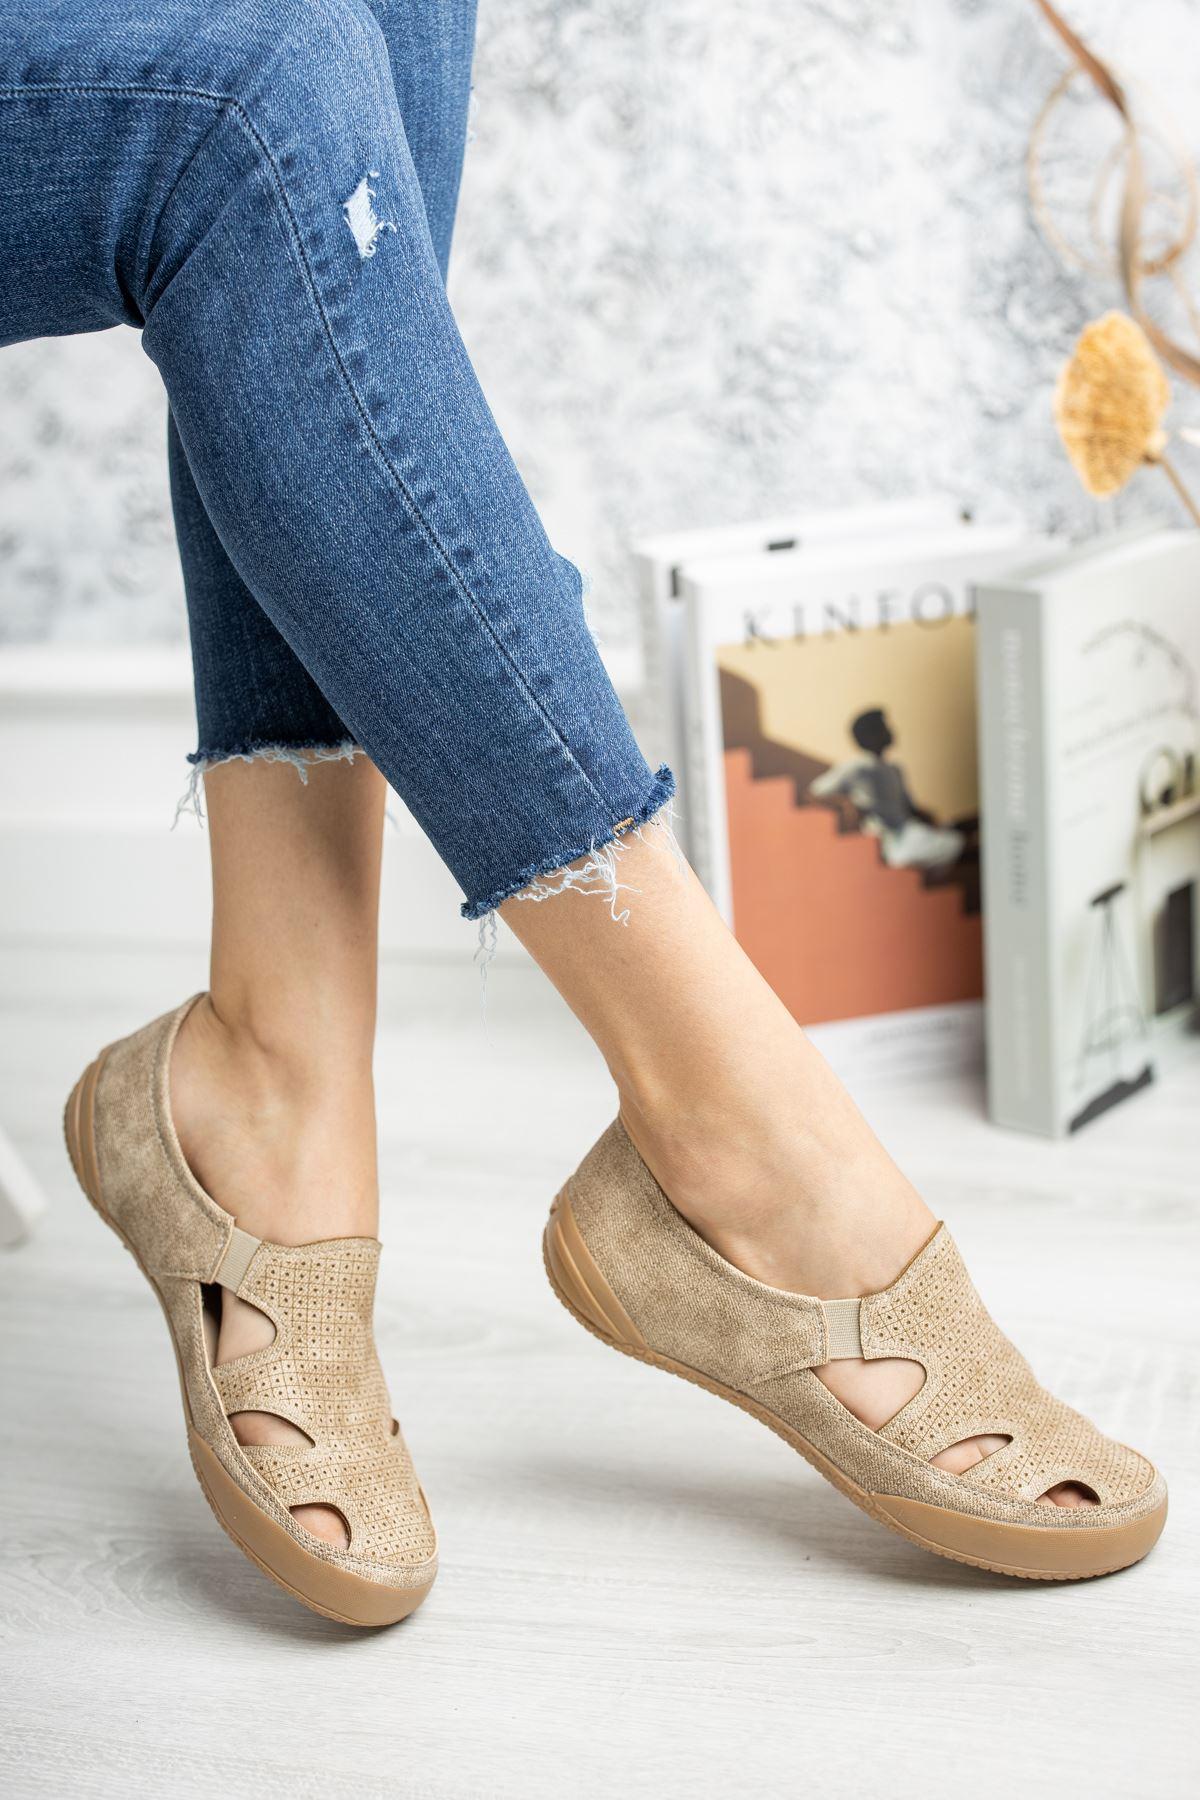 Ortapedik Pedli Lastikli Vizon Ayakkabı